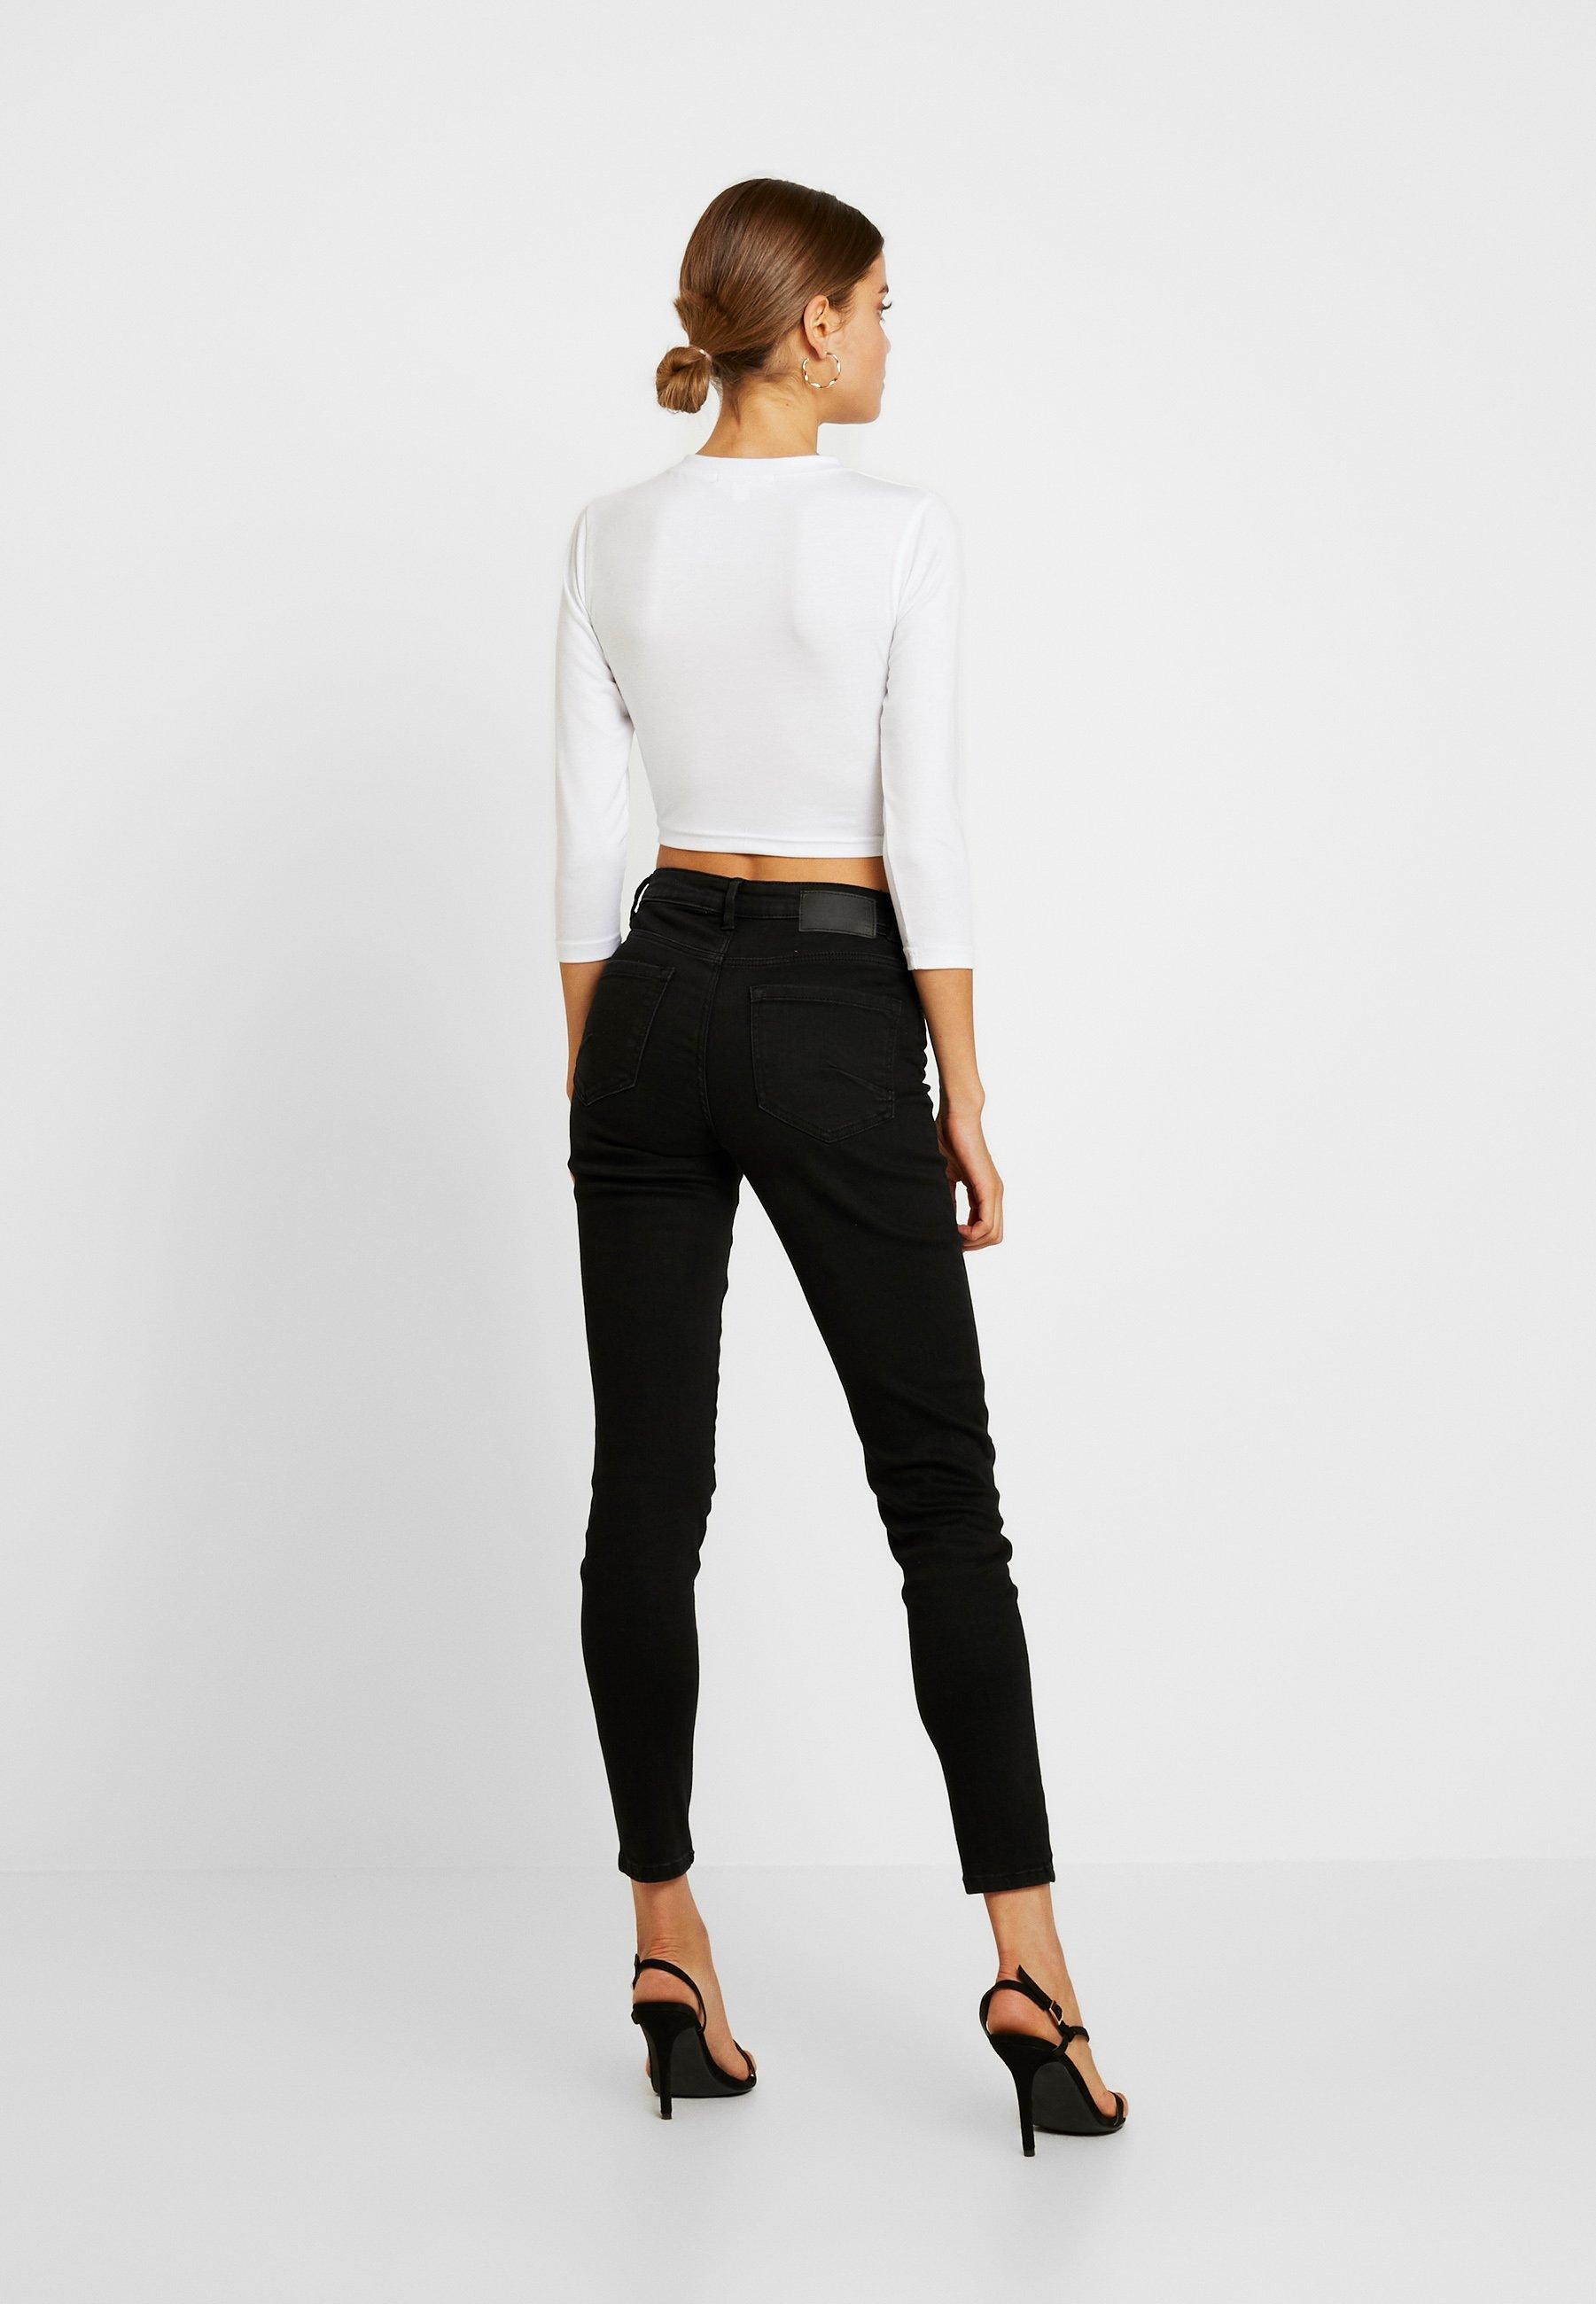 Missguided Front Longues CropT White Long Sleeve shirt À Button Manches 4Rj3cLqA5